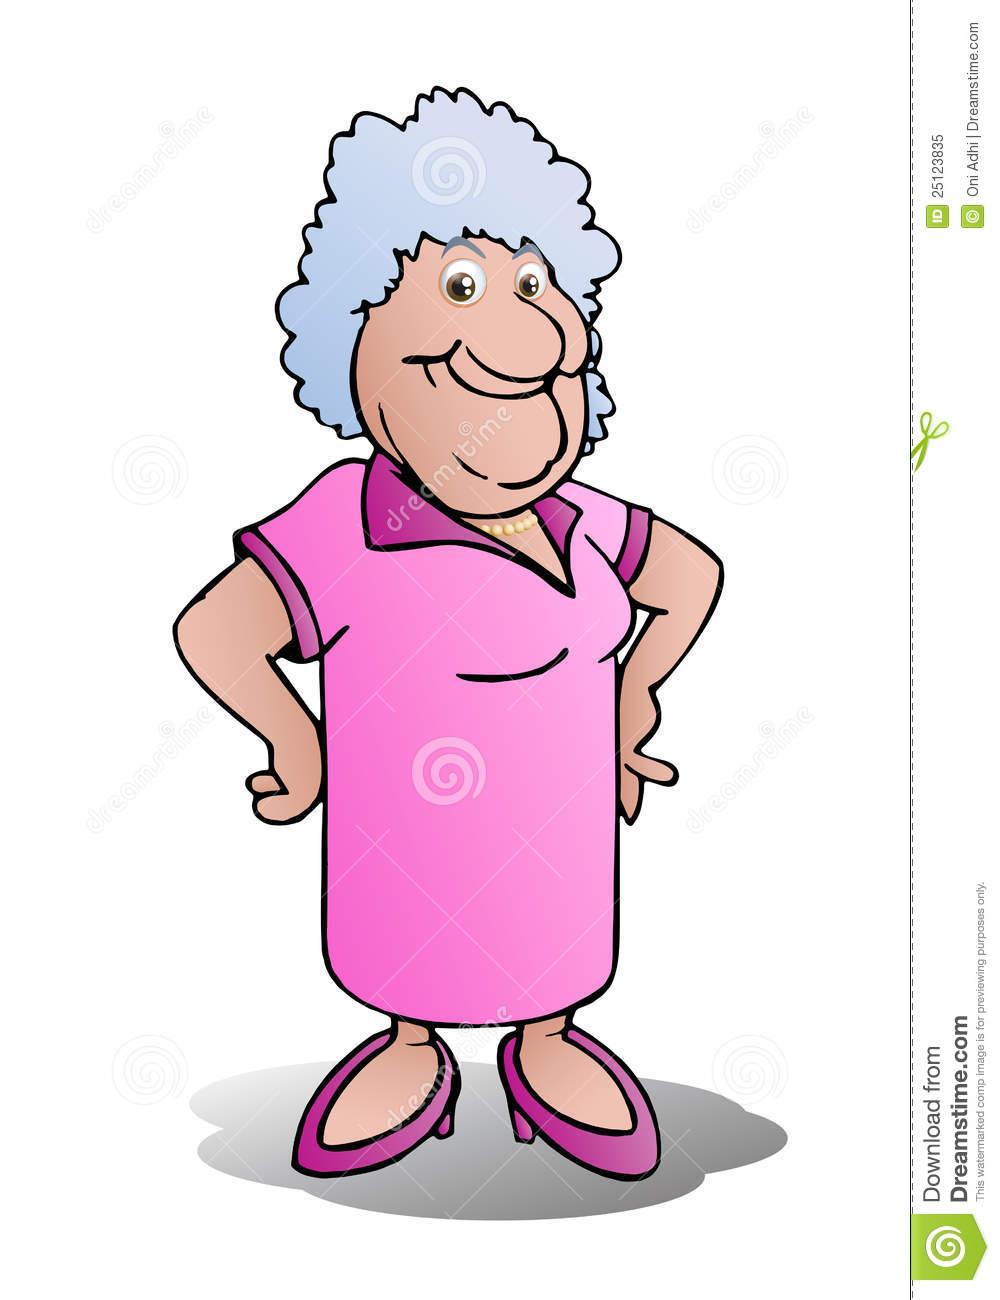 grandmother clip art clipart panda free clipart images rh clipartpanda com grandma clipart face grandma clip art free